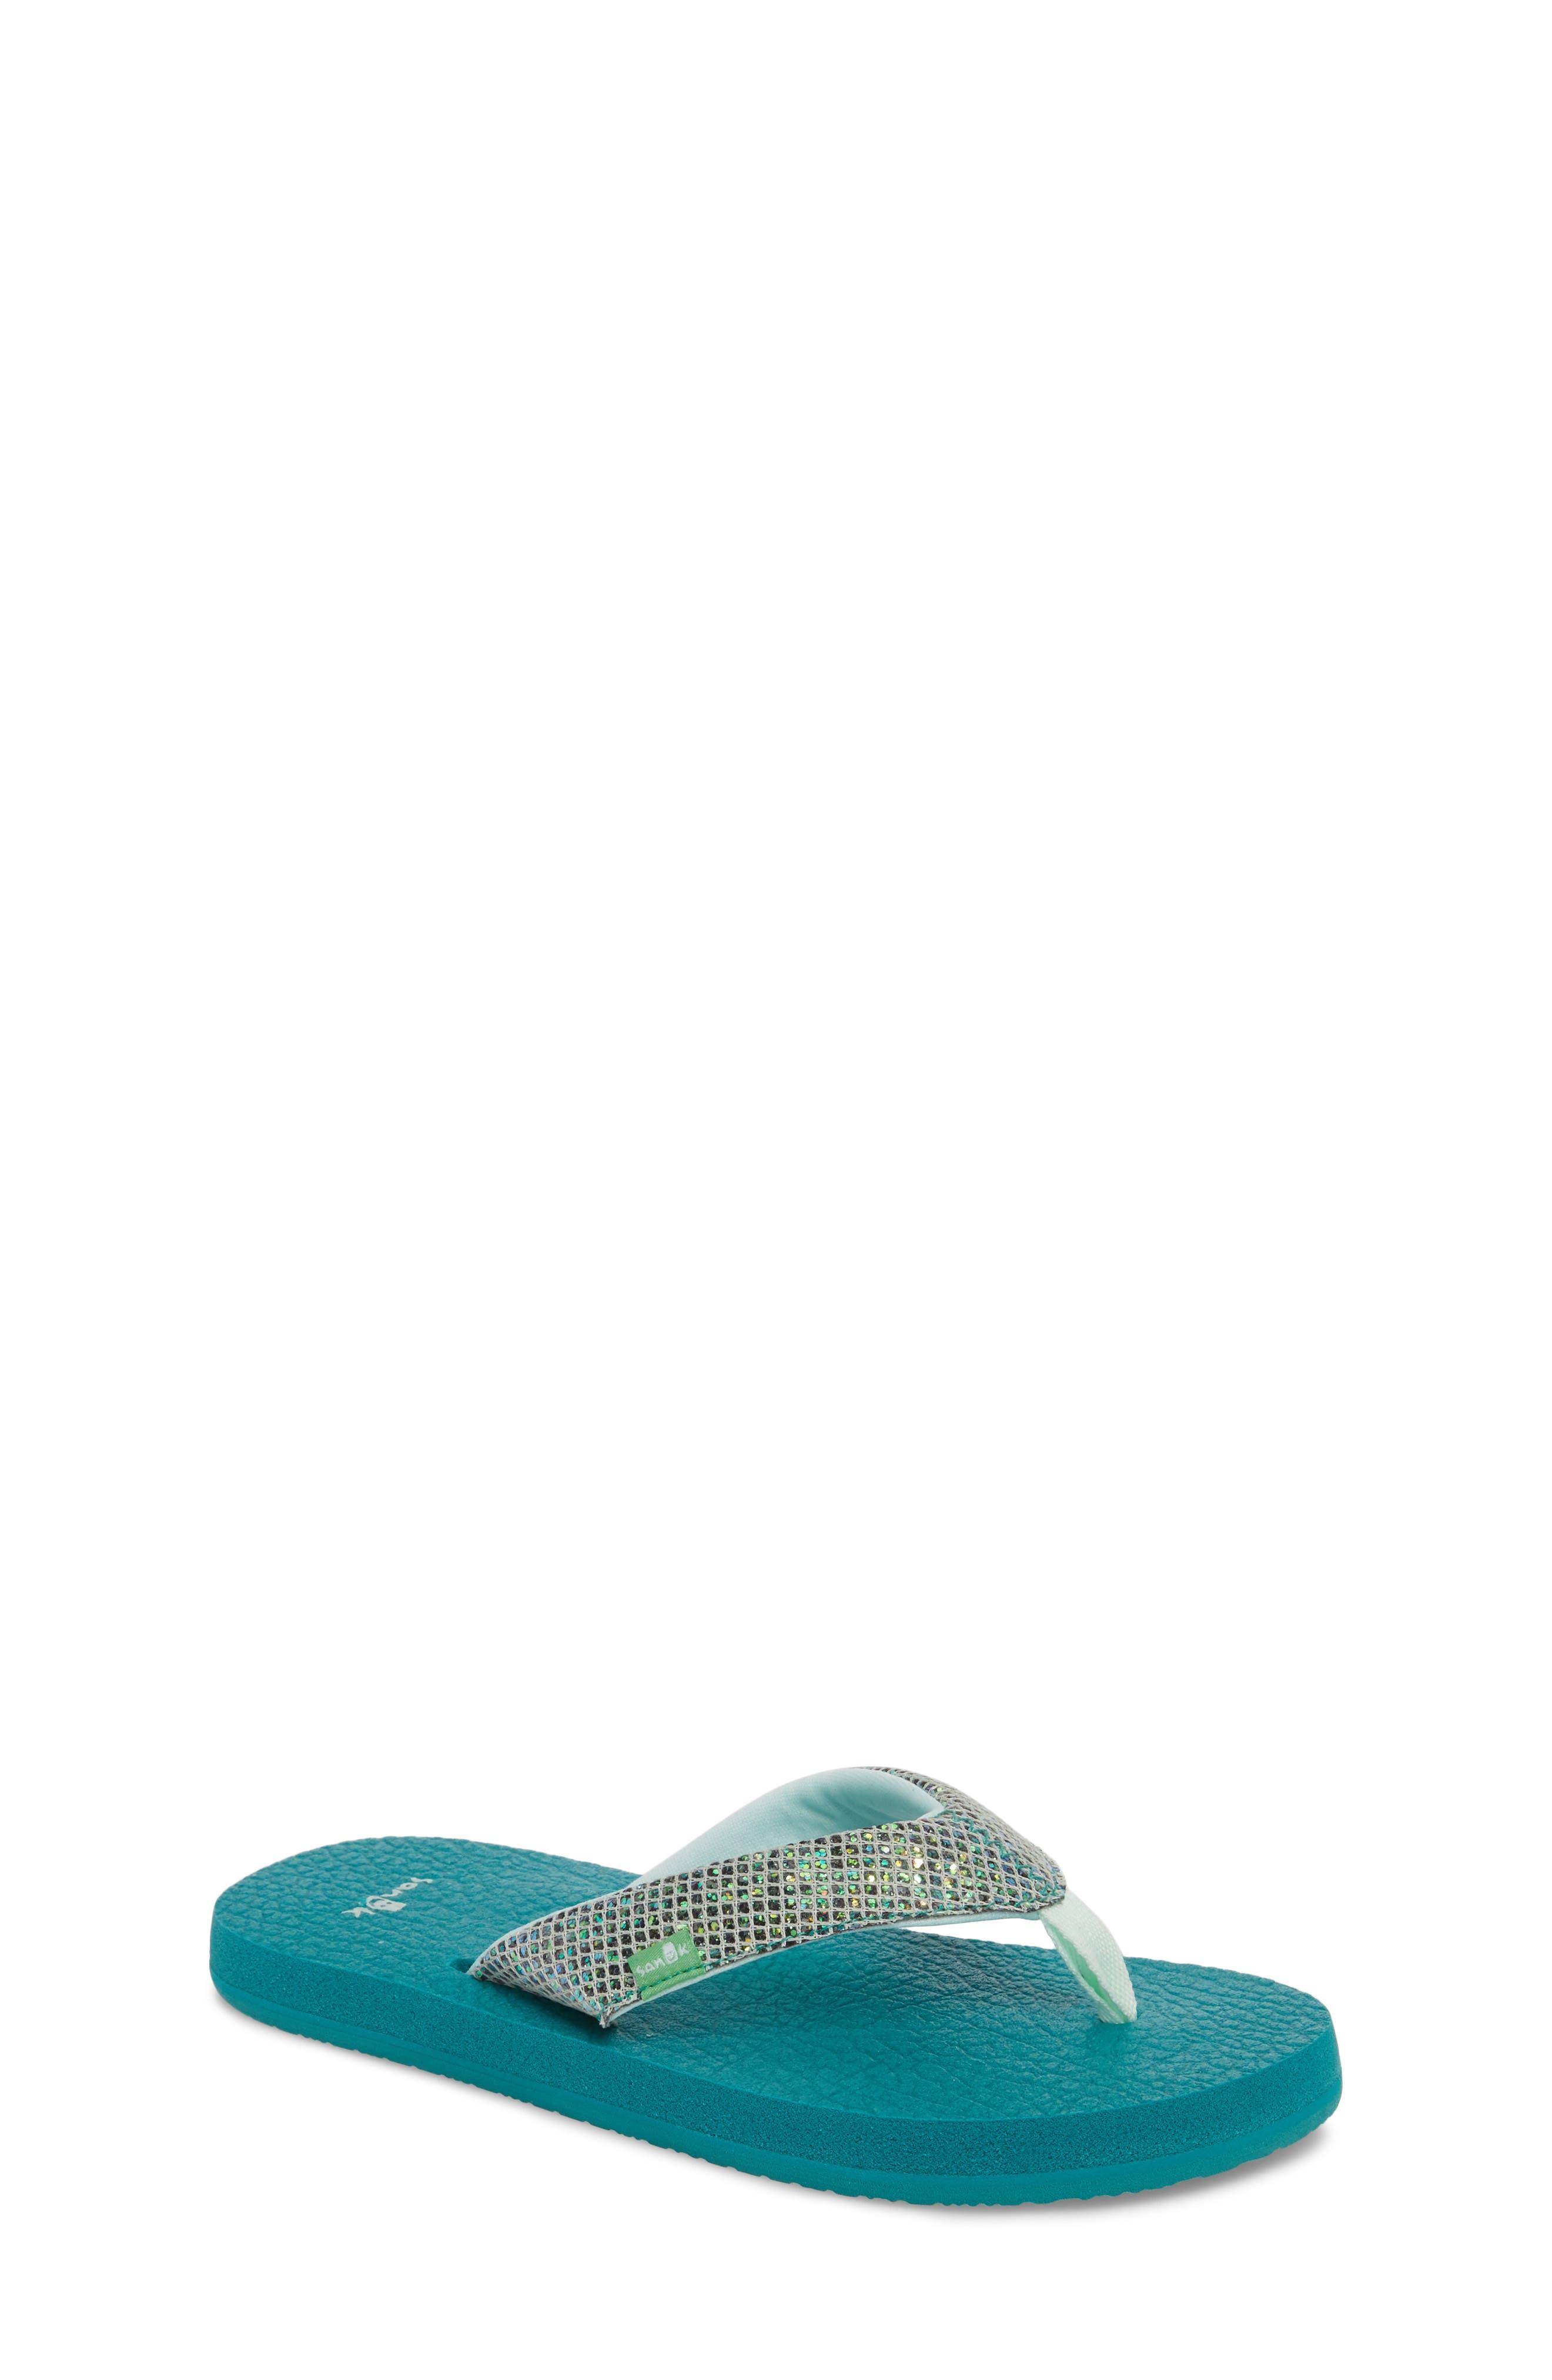 SANUK 'Yoga' Glitter Sandal, Main, color, SEA GREEN